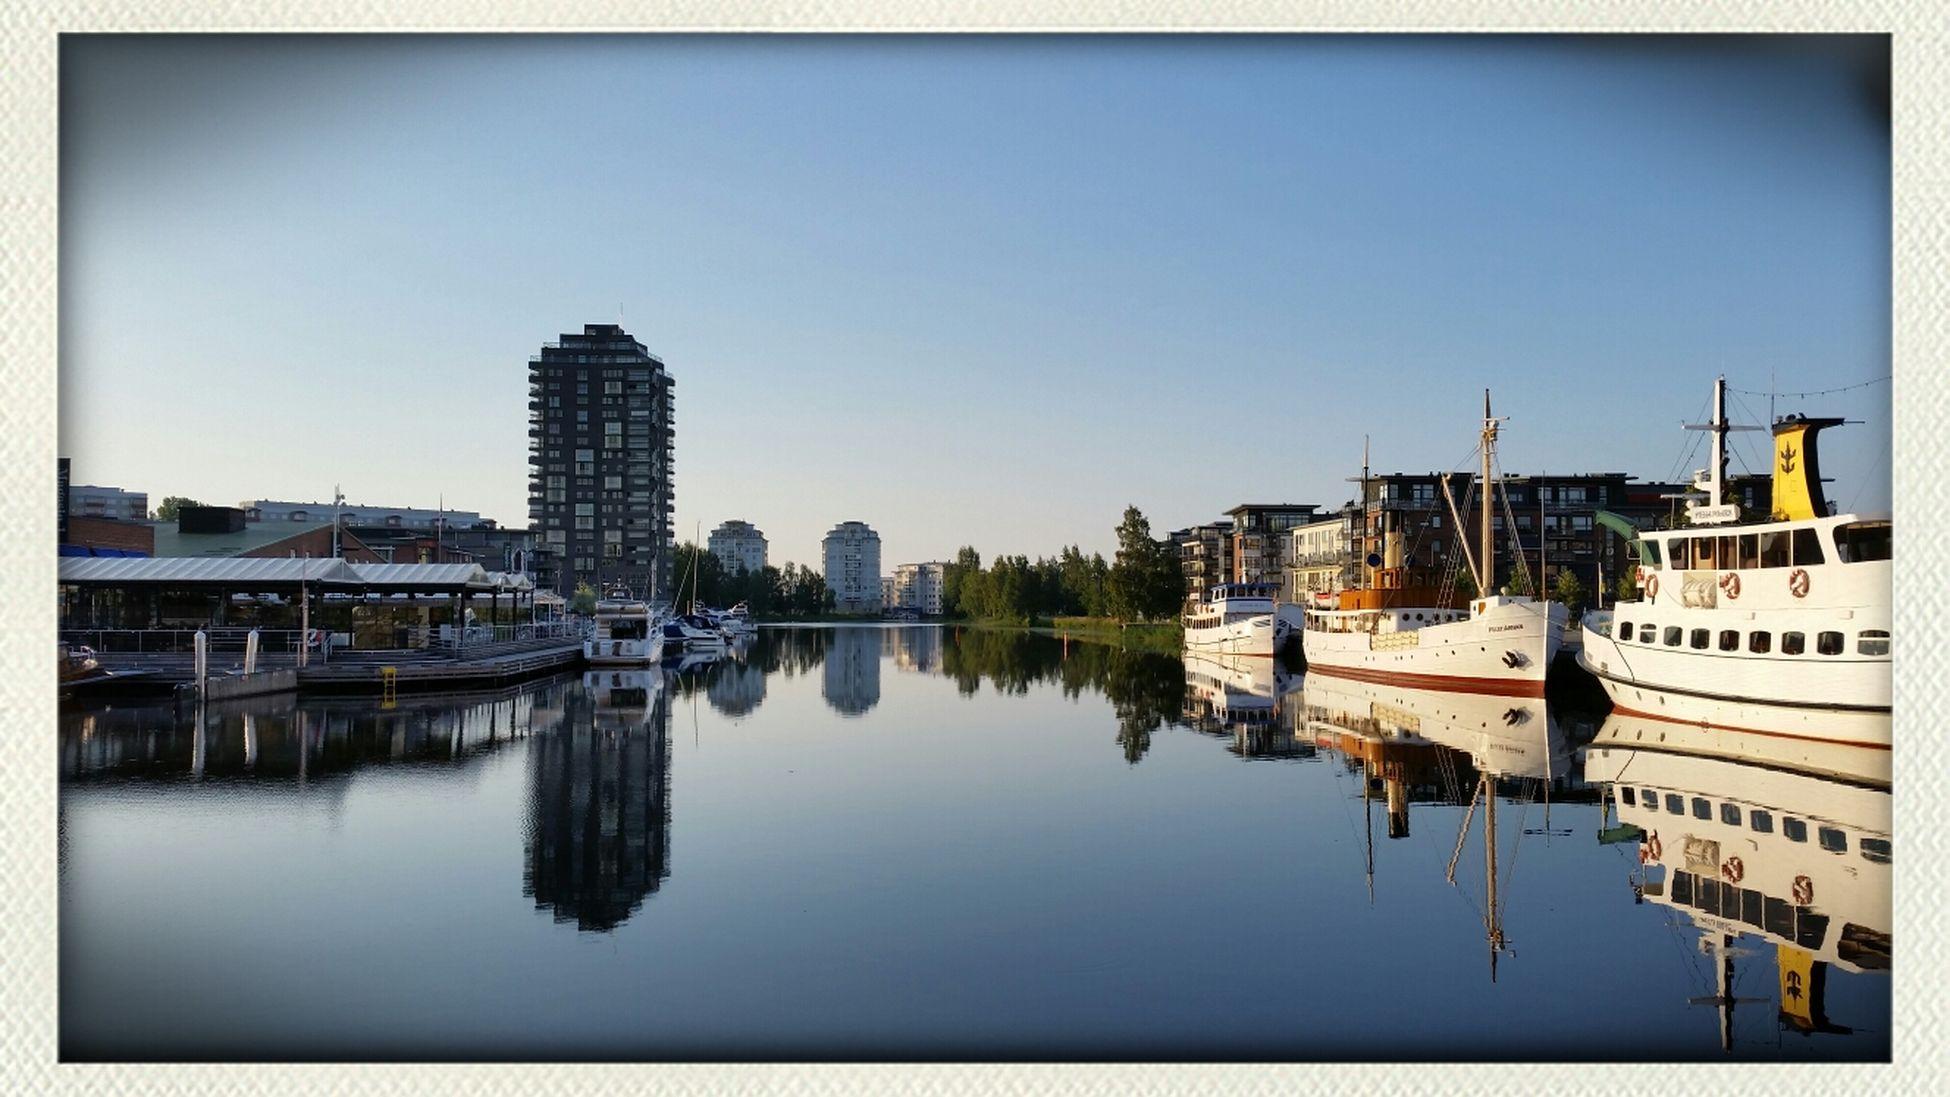 Tidig morgon i Karlstad First Eyeem Photo